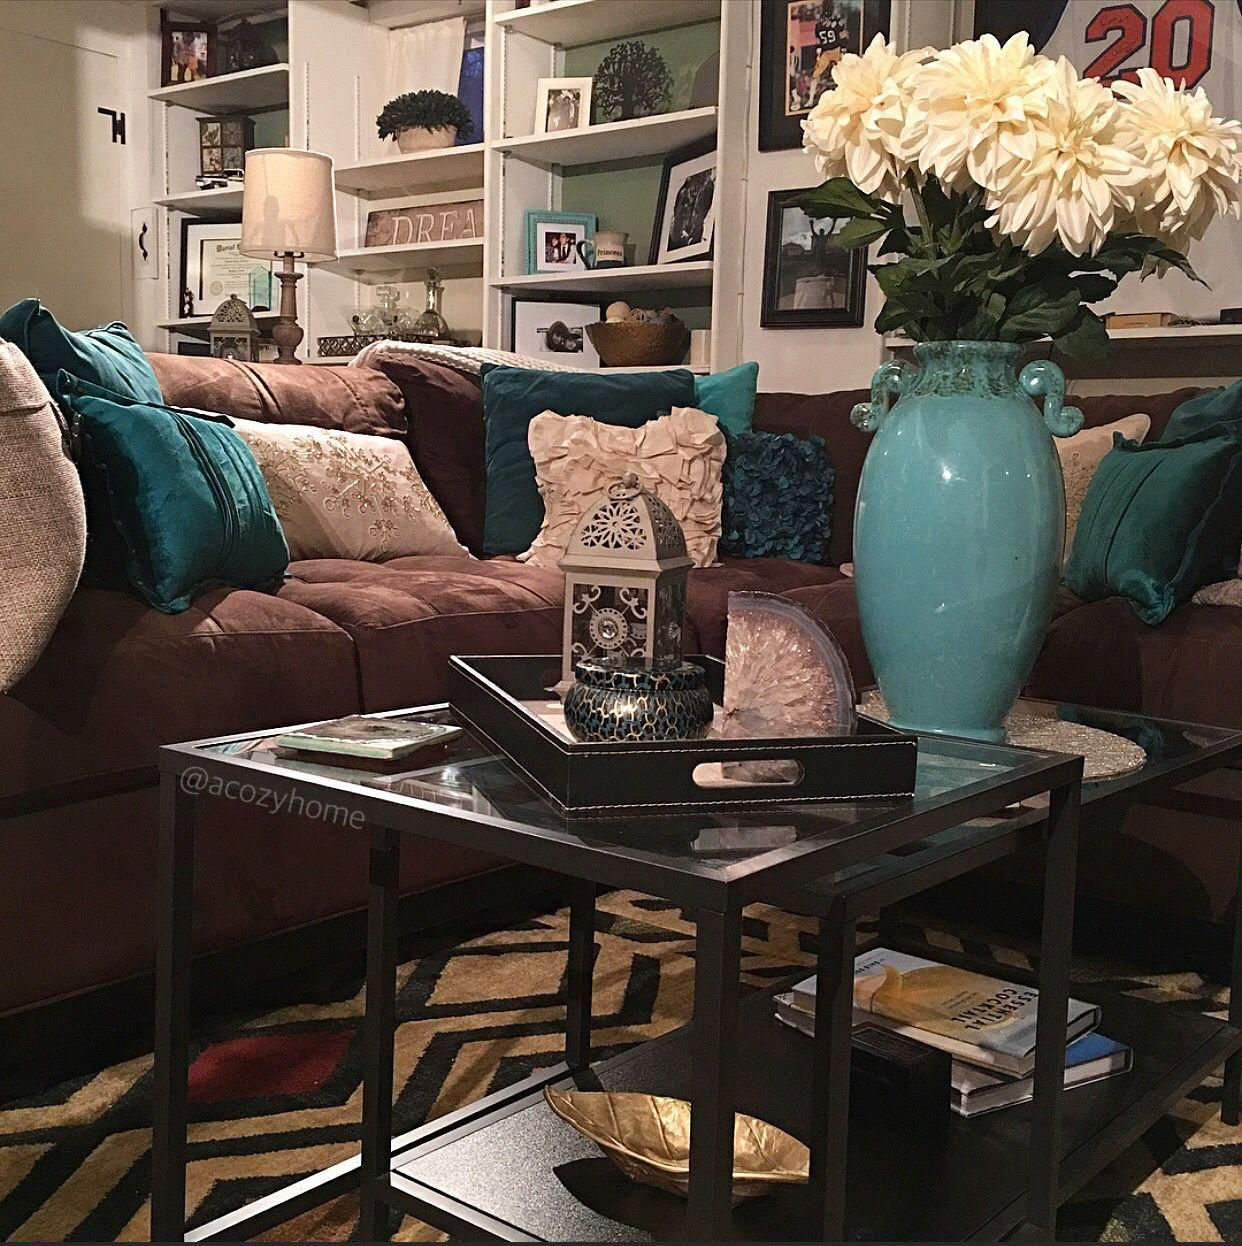 5 Stunning and Mesmerizing Turquoise Room Decoration Ideas ...